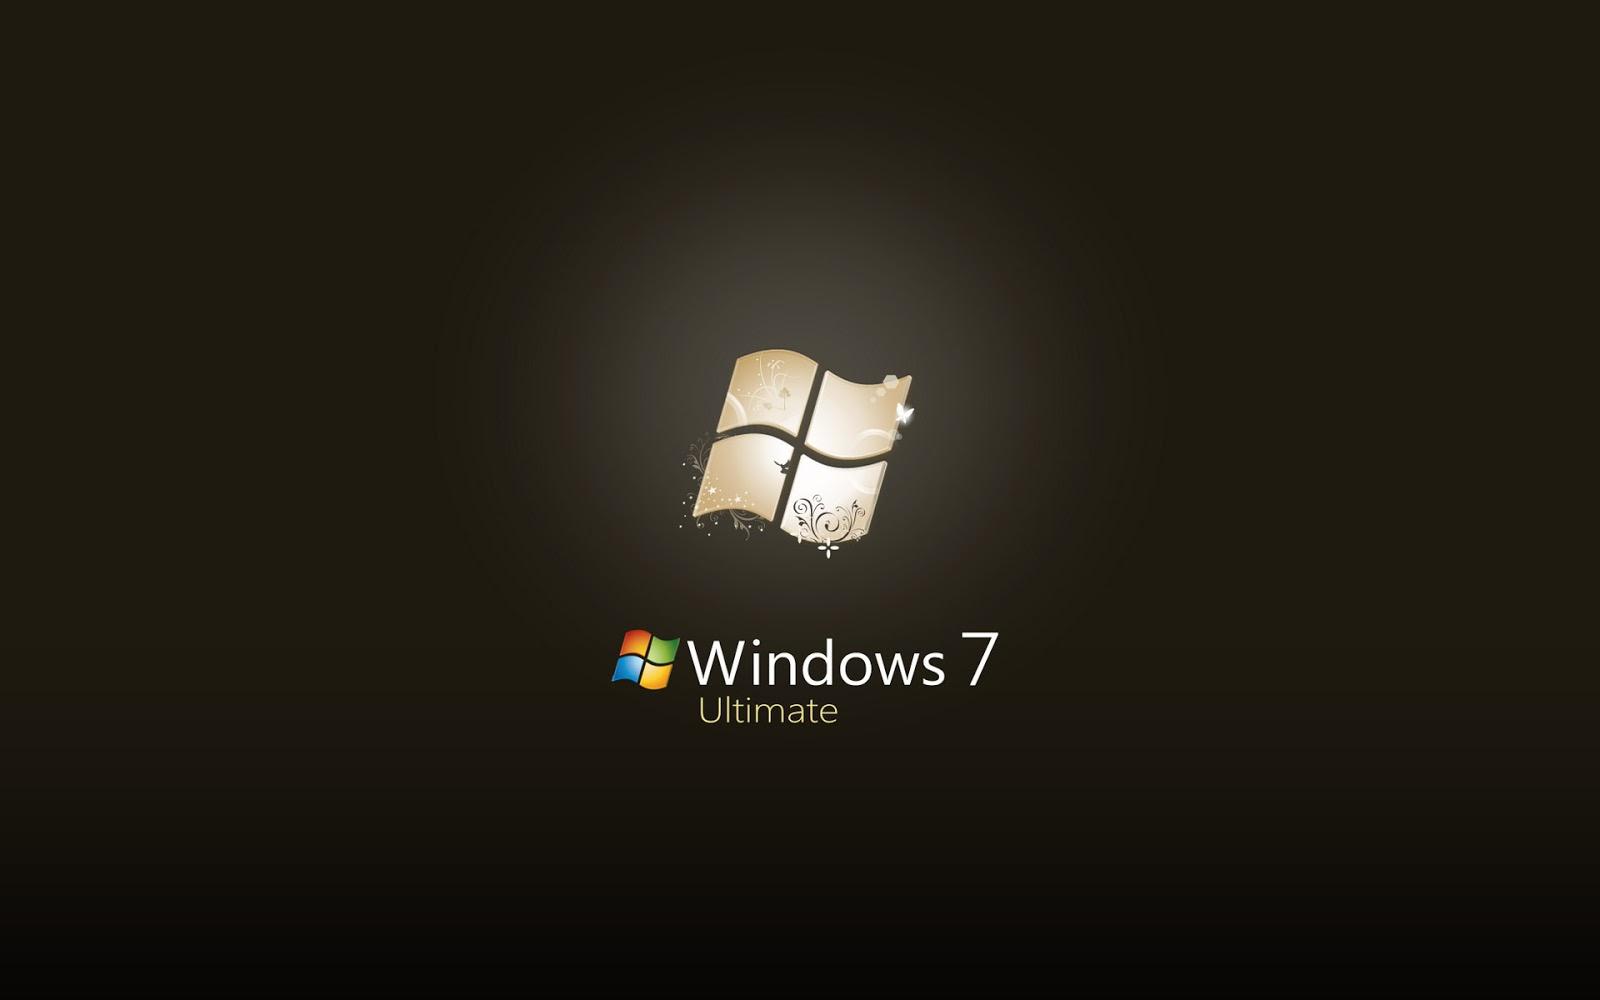 Wallpaper windows 7 full hd - Download Wallpaper win 7 ...